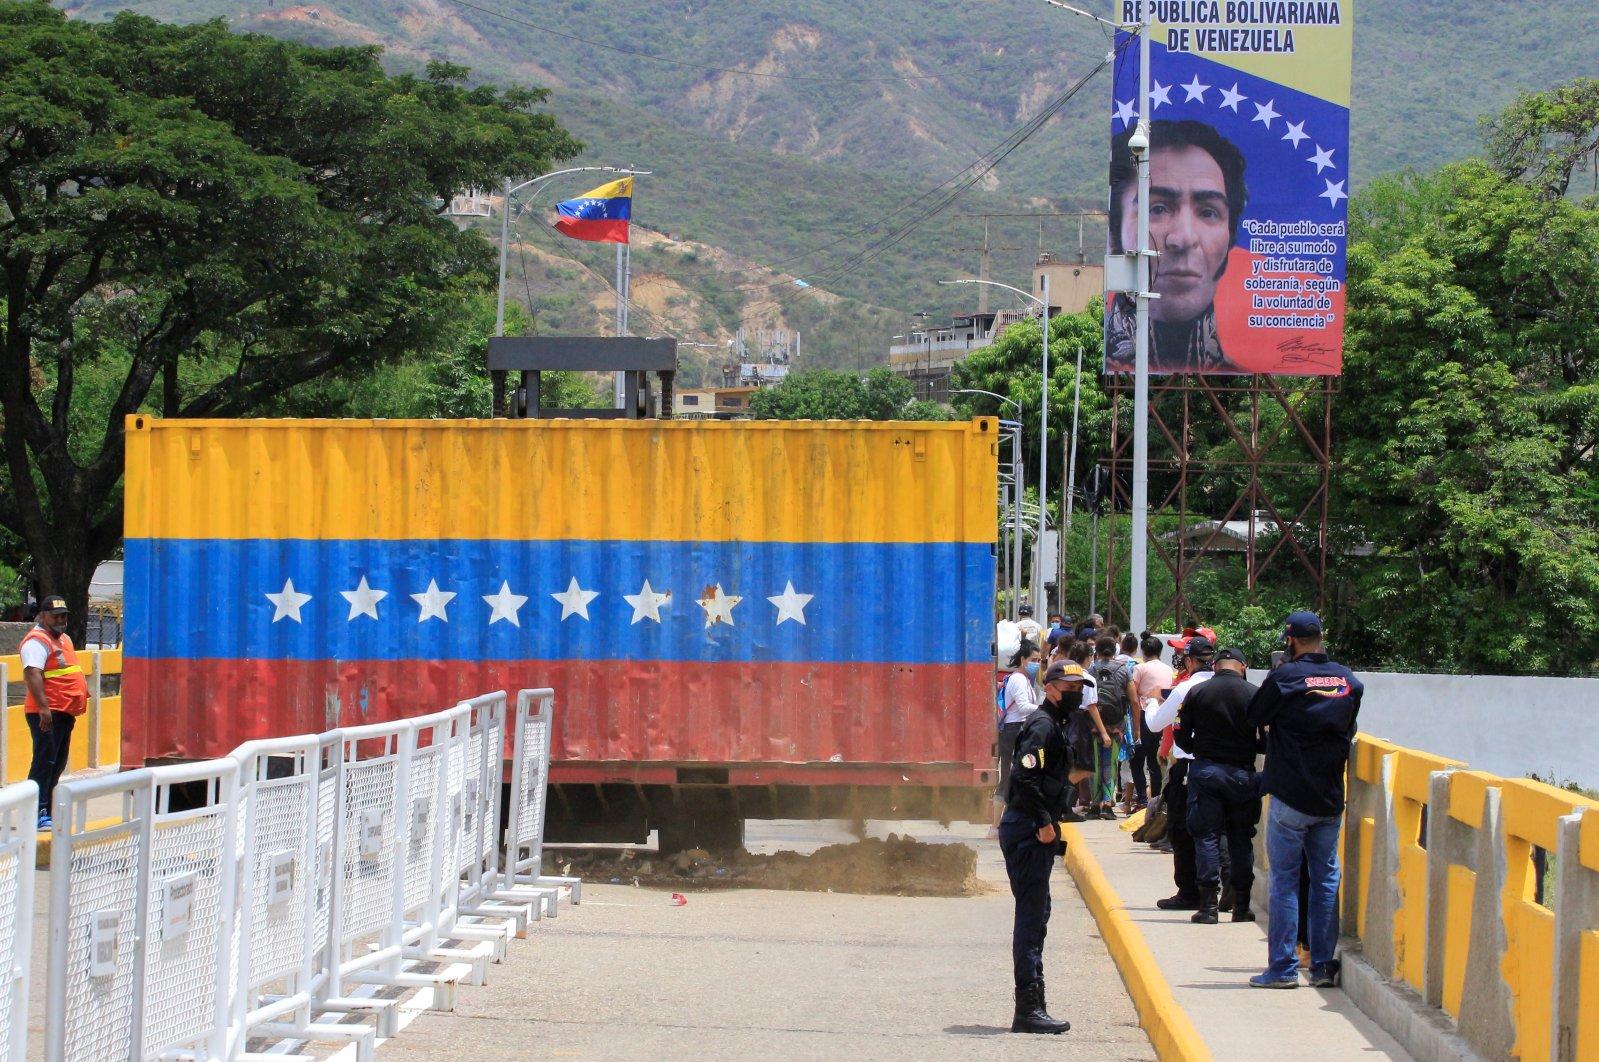 Authorities walk next to one of the containers that block the border crossing between Colombia and Venezuela, at the Simon Bolivar international bridge, in San Antonio del Tachira, Venezuela, Oct. 4, 2021. (EPA Photo)